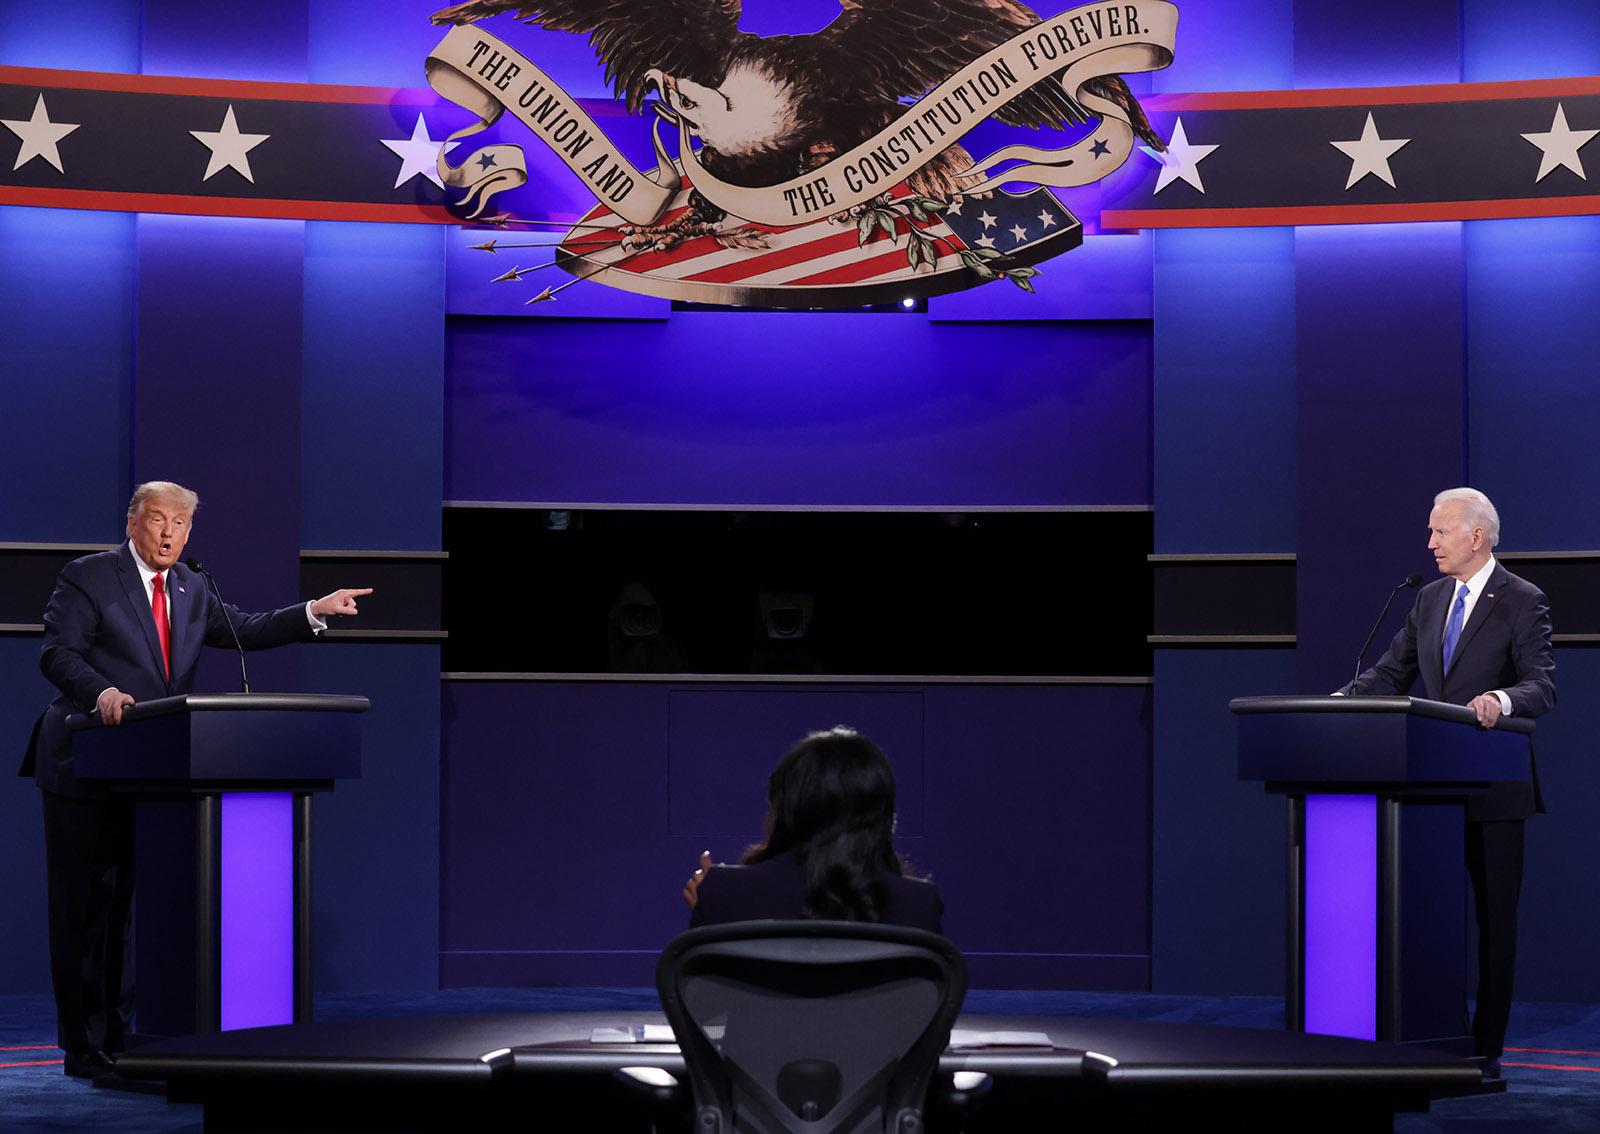 President Donald Trump and Democratic presidential nominee Joe Biden participate in the final presidential debate at Belmont University on October 22 in Nashville.